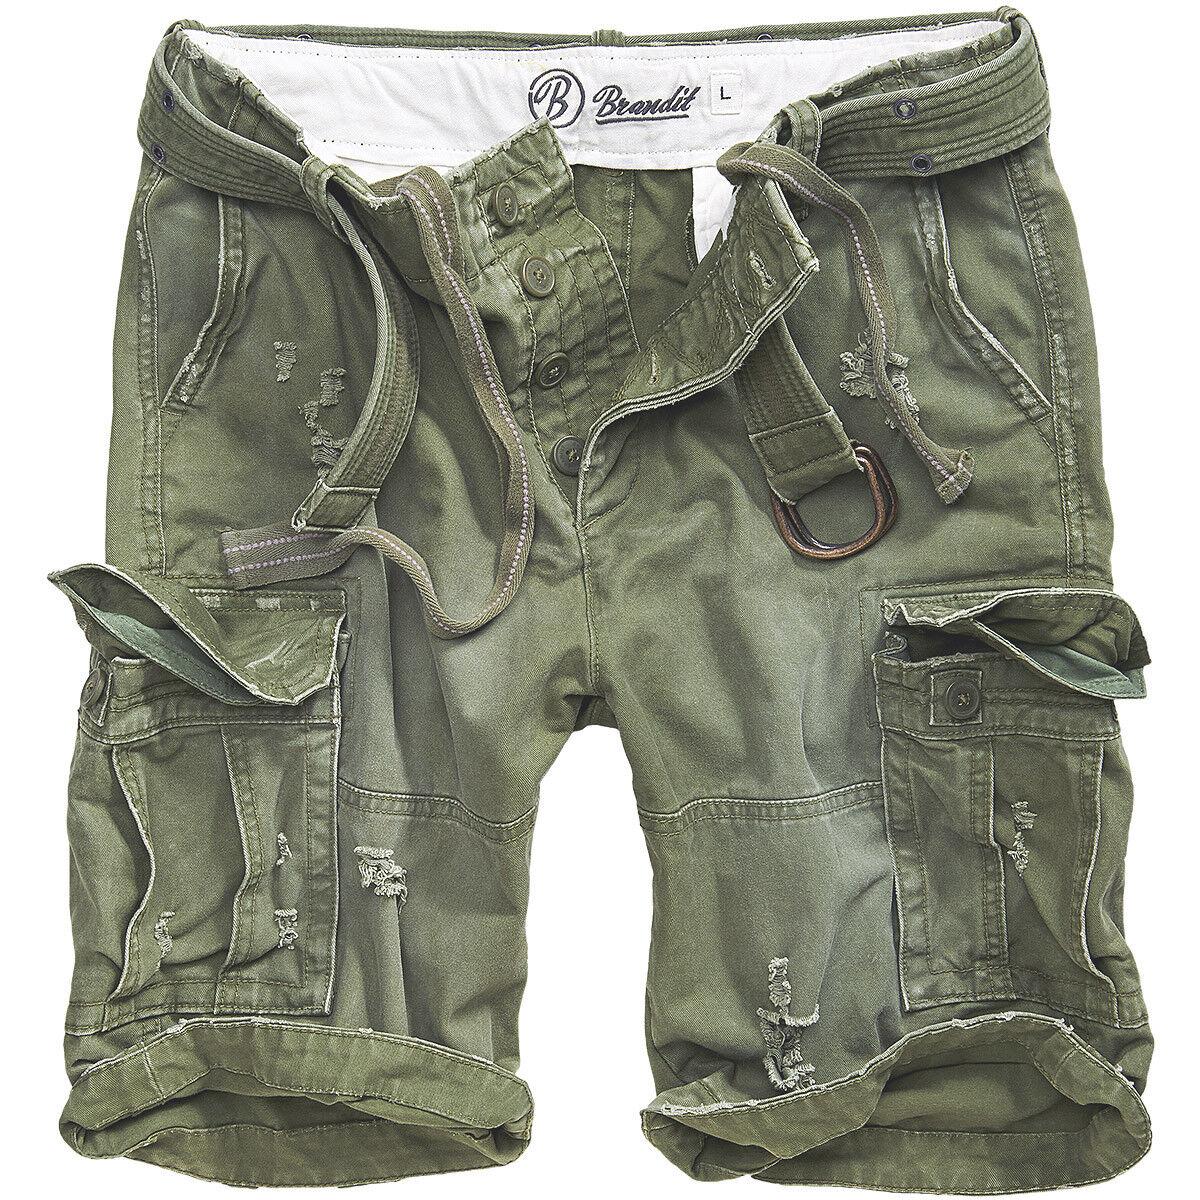 Brandit Shell Valley Heavy Cotton Vintage Mens Shorts Hiking Travel Pants Olive